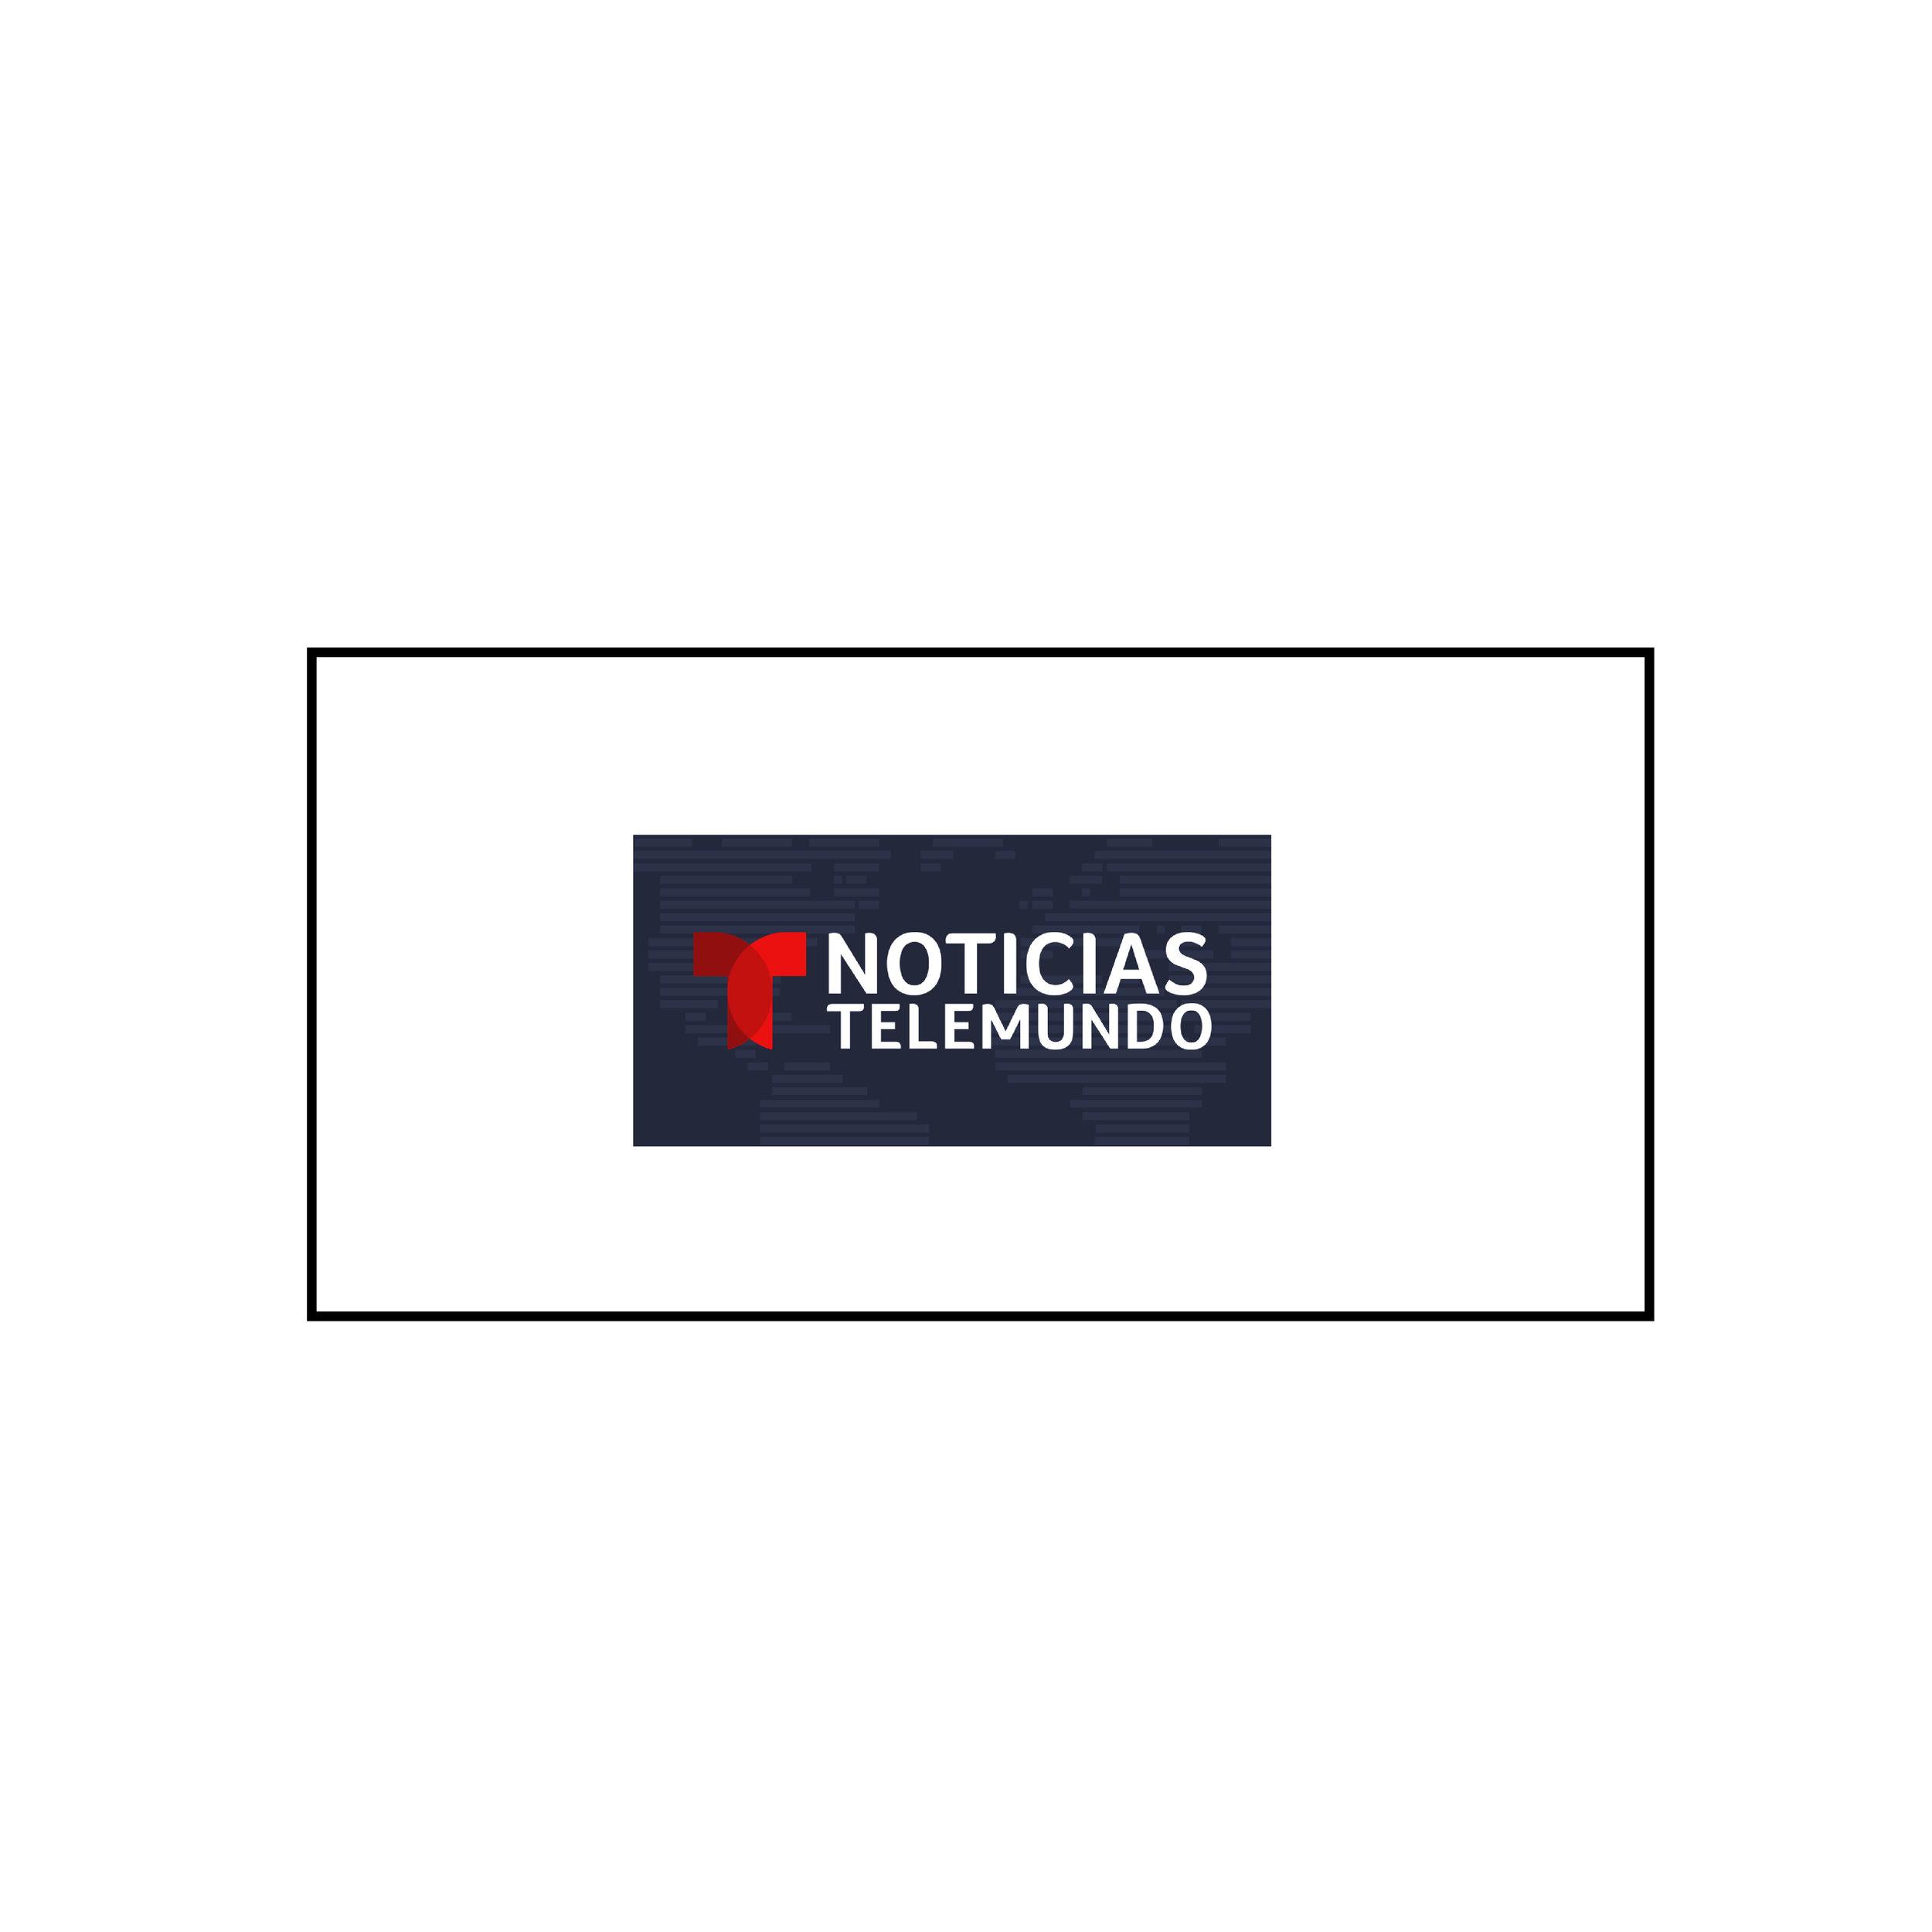 Voices-Telemundo Noticias_TELEMUNDO NOTICIAS.jpg